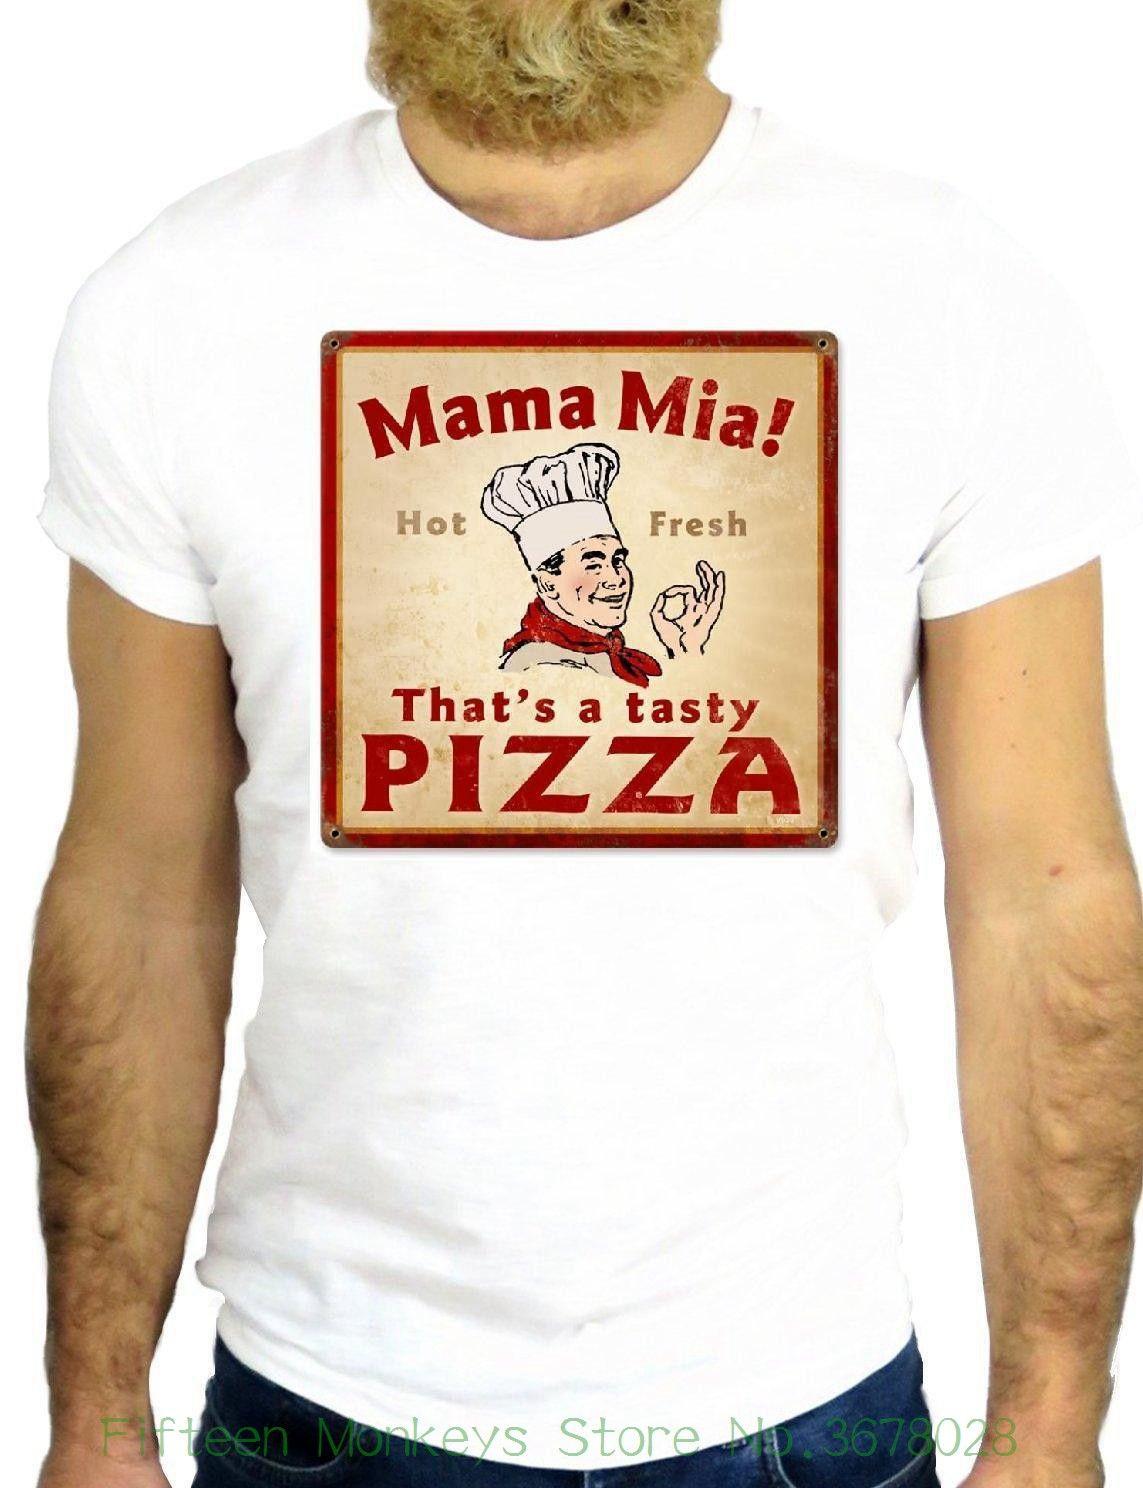 cc8f7b00c New 2018 Fashion Summer T Shirt Jode Z2098 Cool Nice Pizza Mamma Mia  Vintage Italian Food Ggg24 Online with  15.38 Piece on  Fifteenmonkeysstore s Store ...